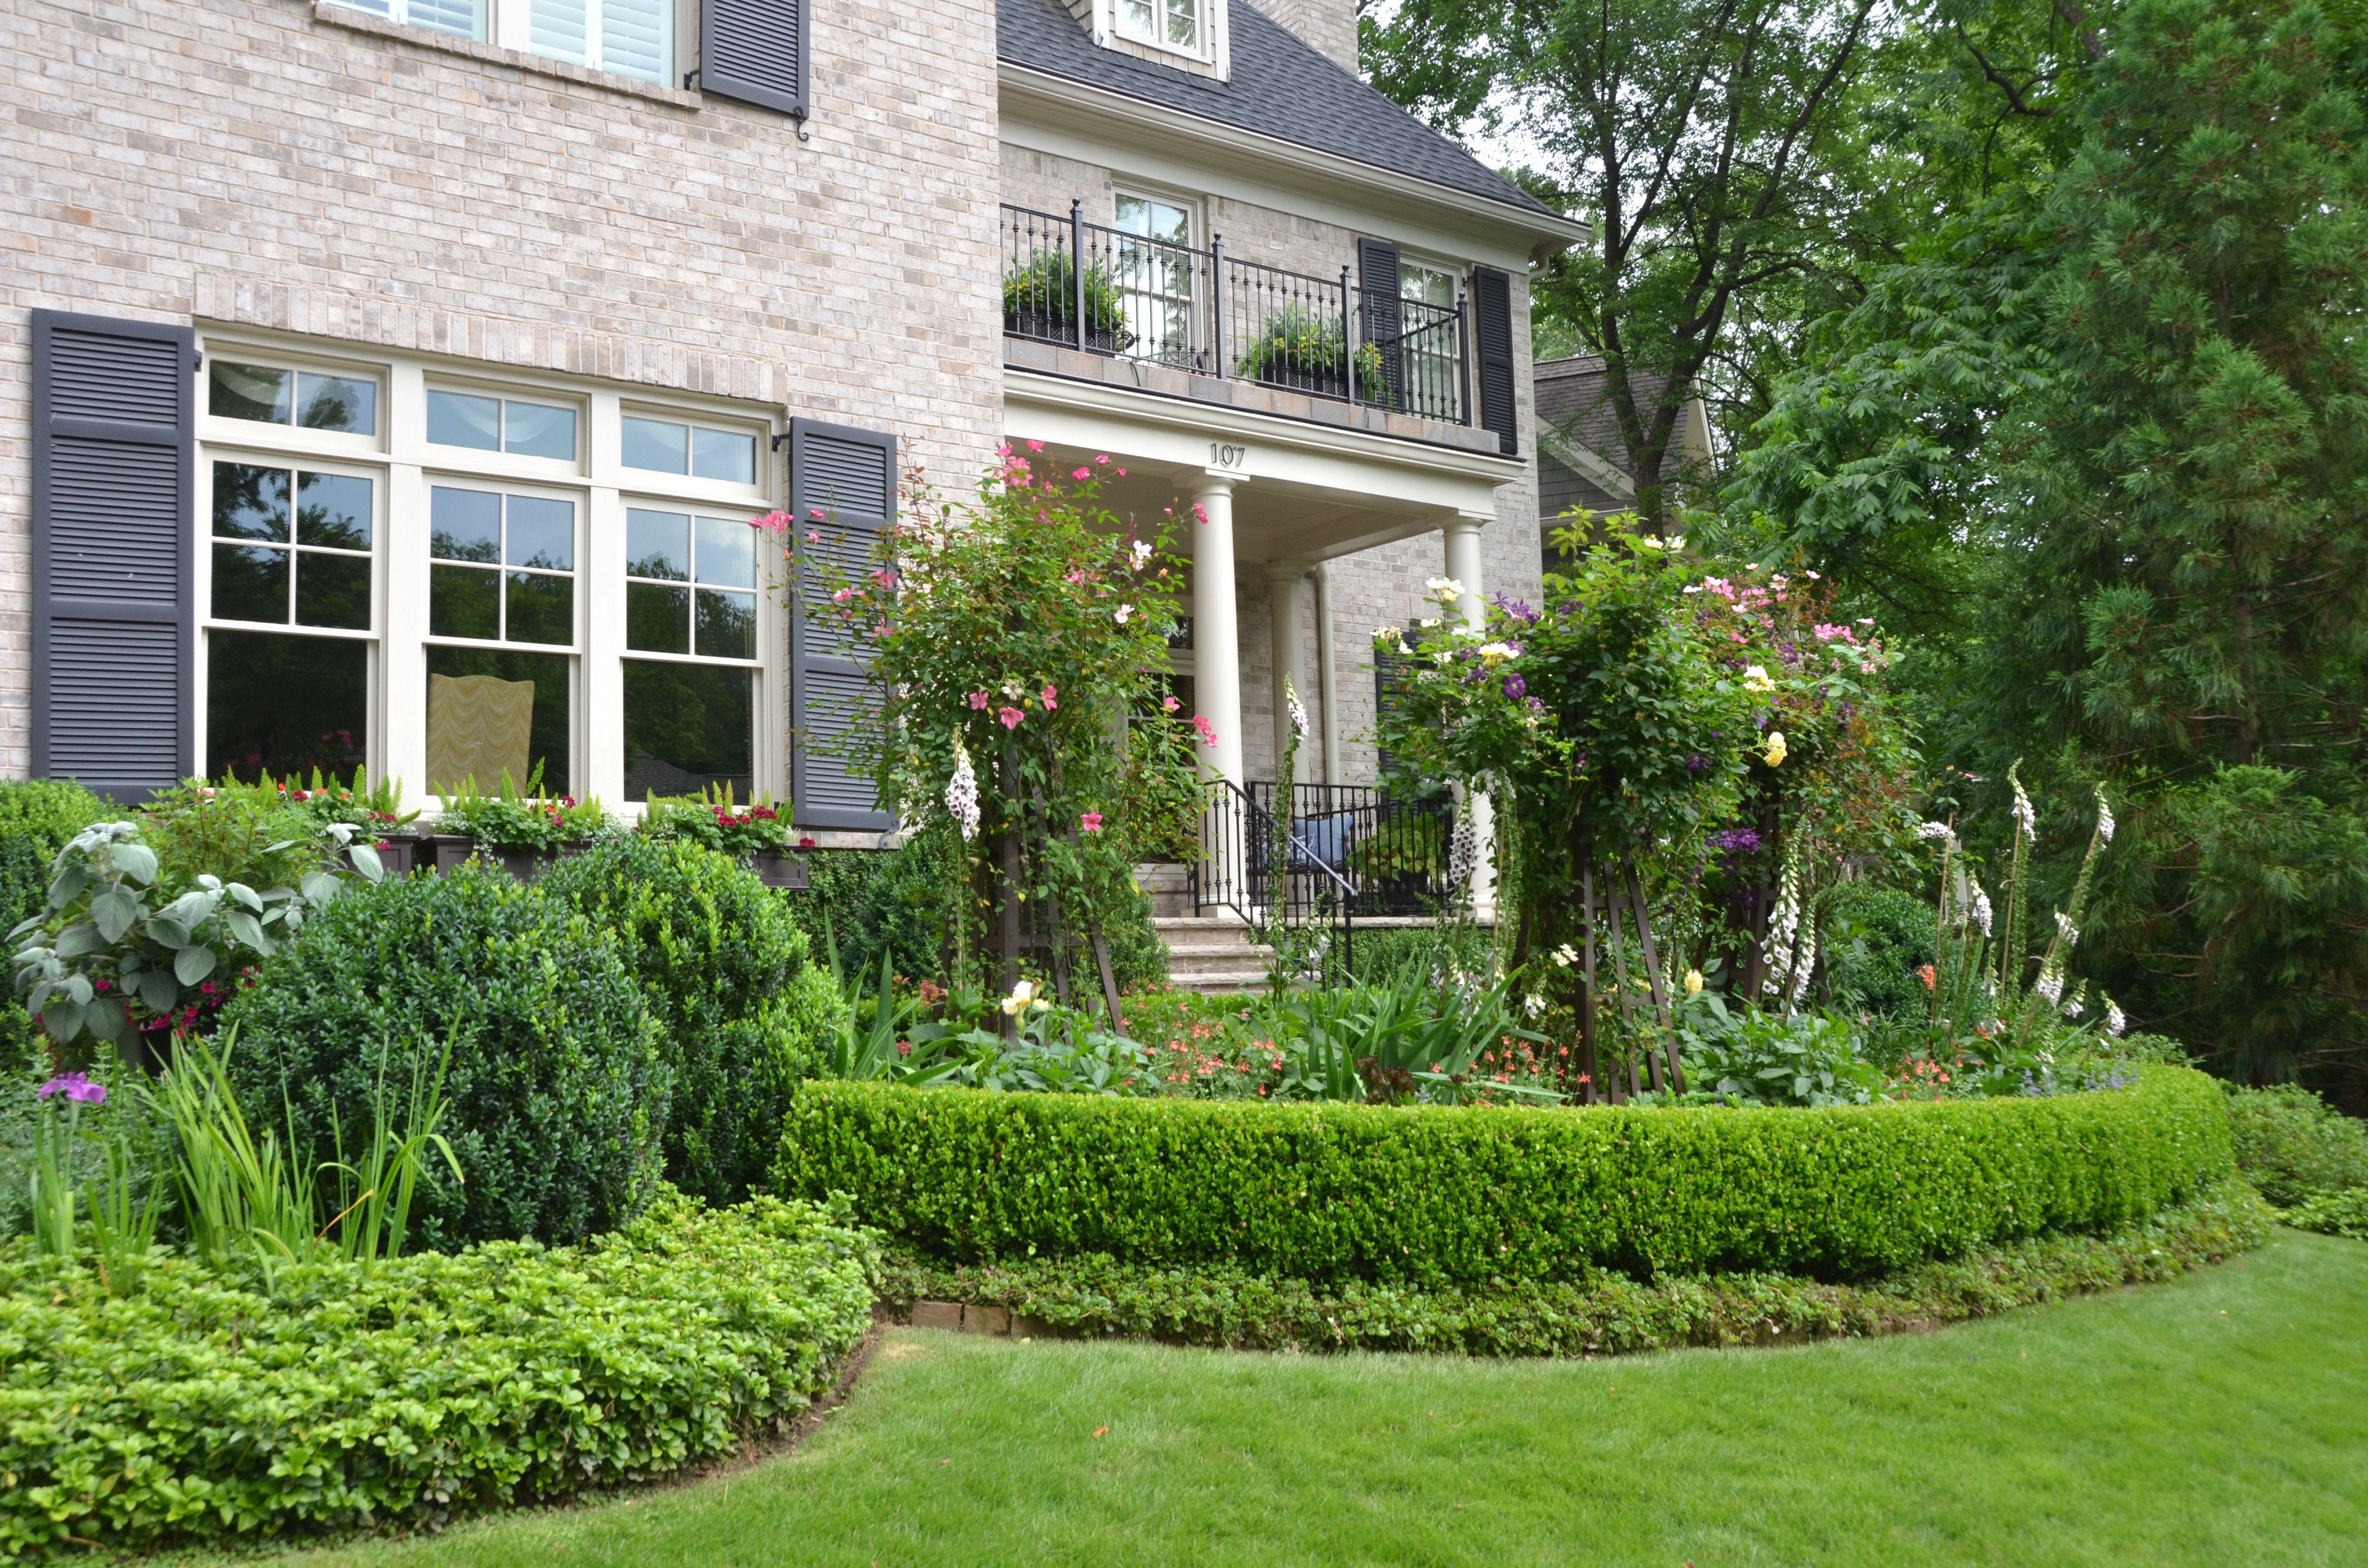 Landscape architect atlanta ga - Parterre Garden With Custom Tuteurs A Planters Design Atlanta Ga